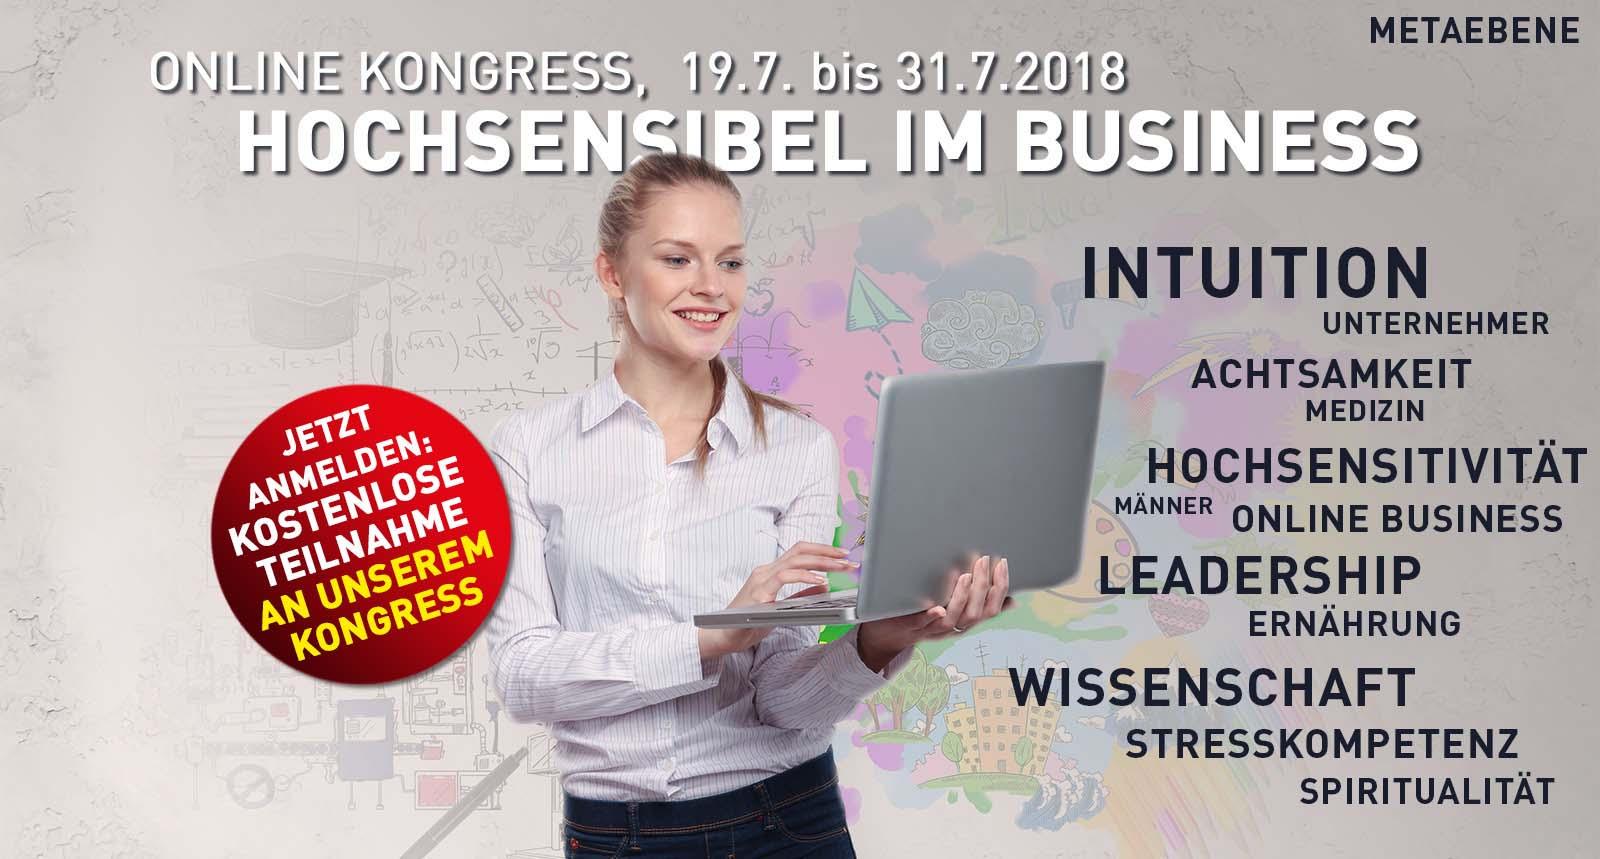 Hochsensibel im Business Online Kongress 2018